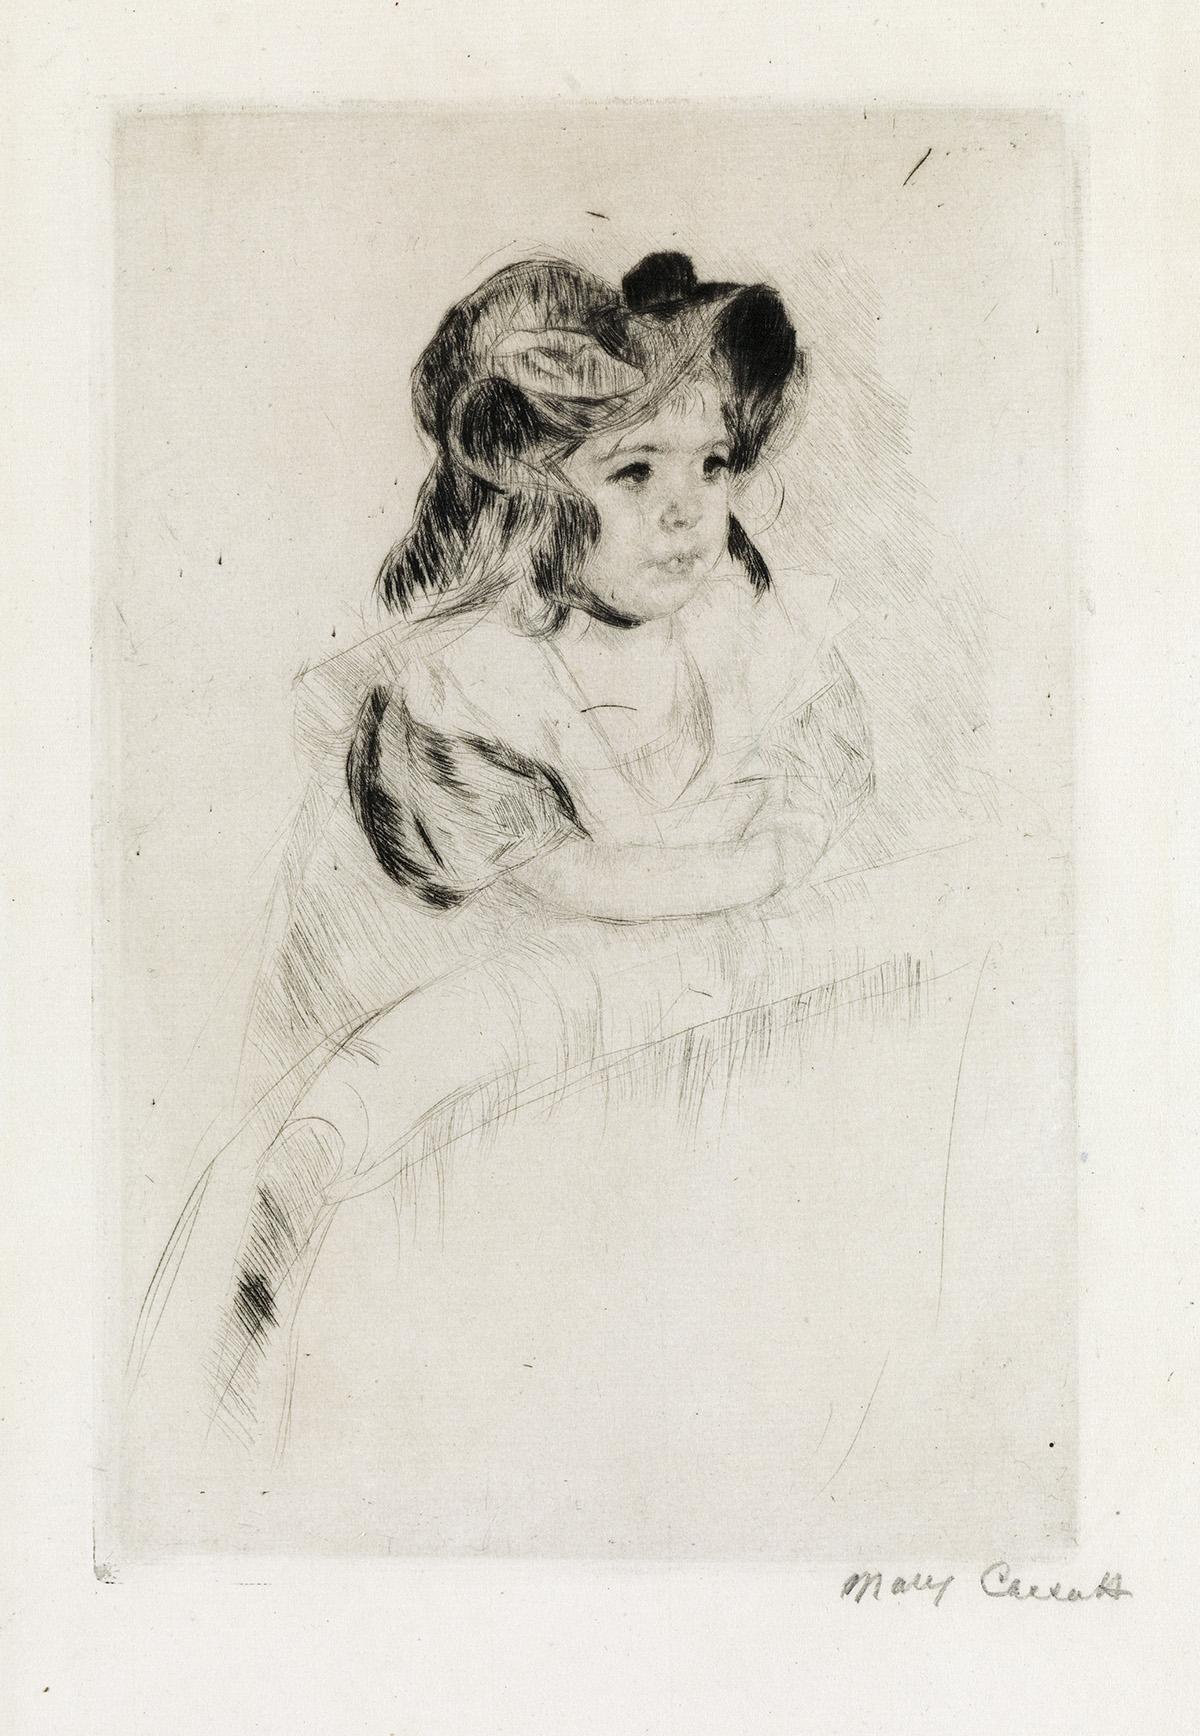 MARY CASSATT Margot Resting her Arms on Back of Armchair.